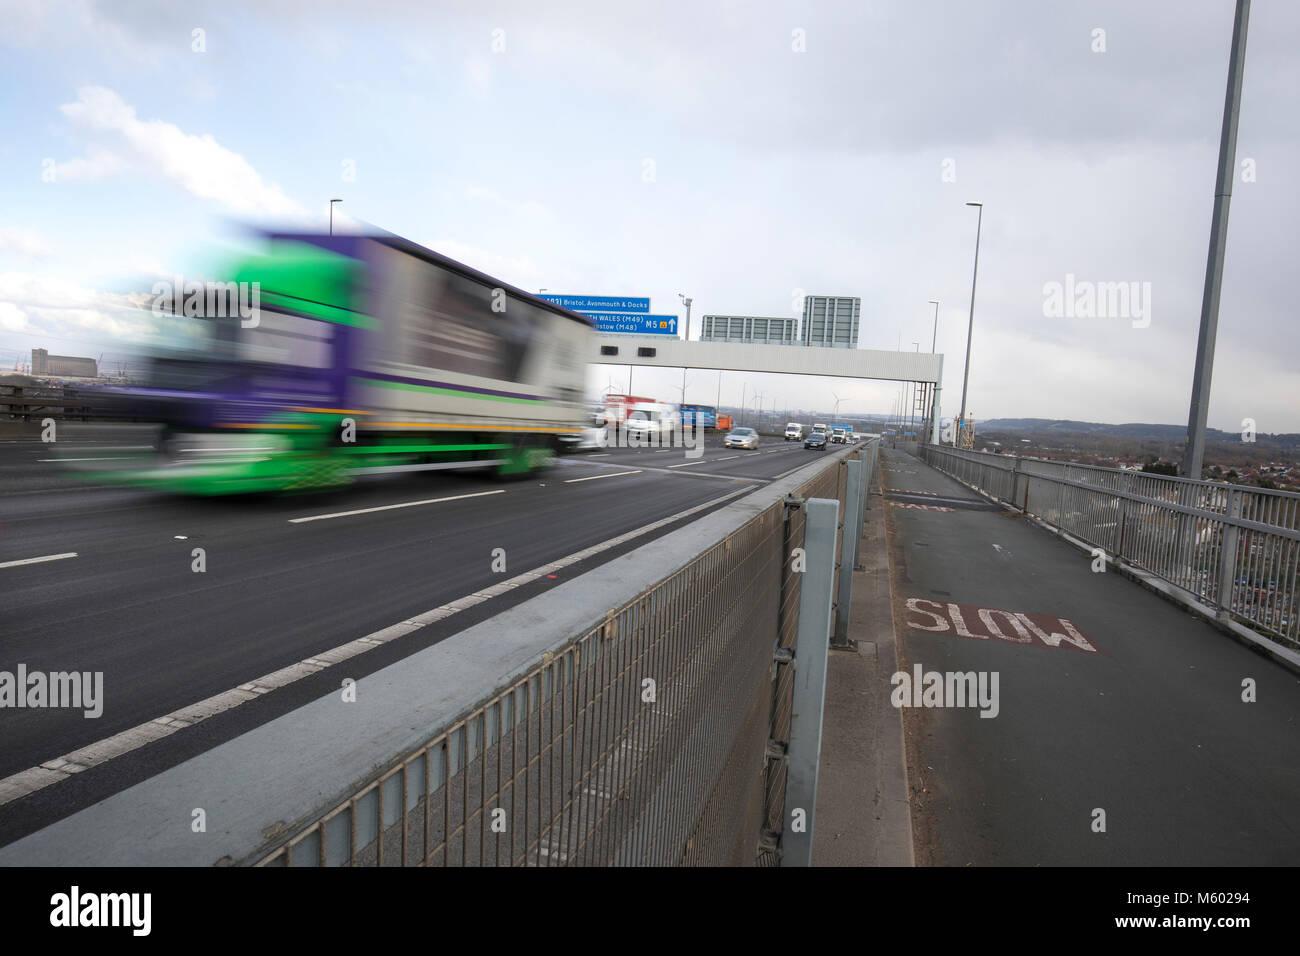 Road traffic crossing the Avonmouth bridge on the M5 motorway - Stock Image